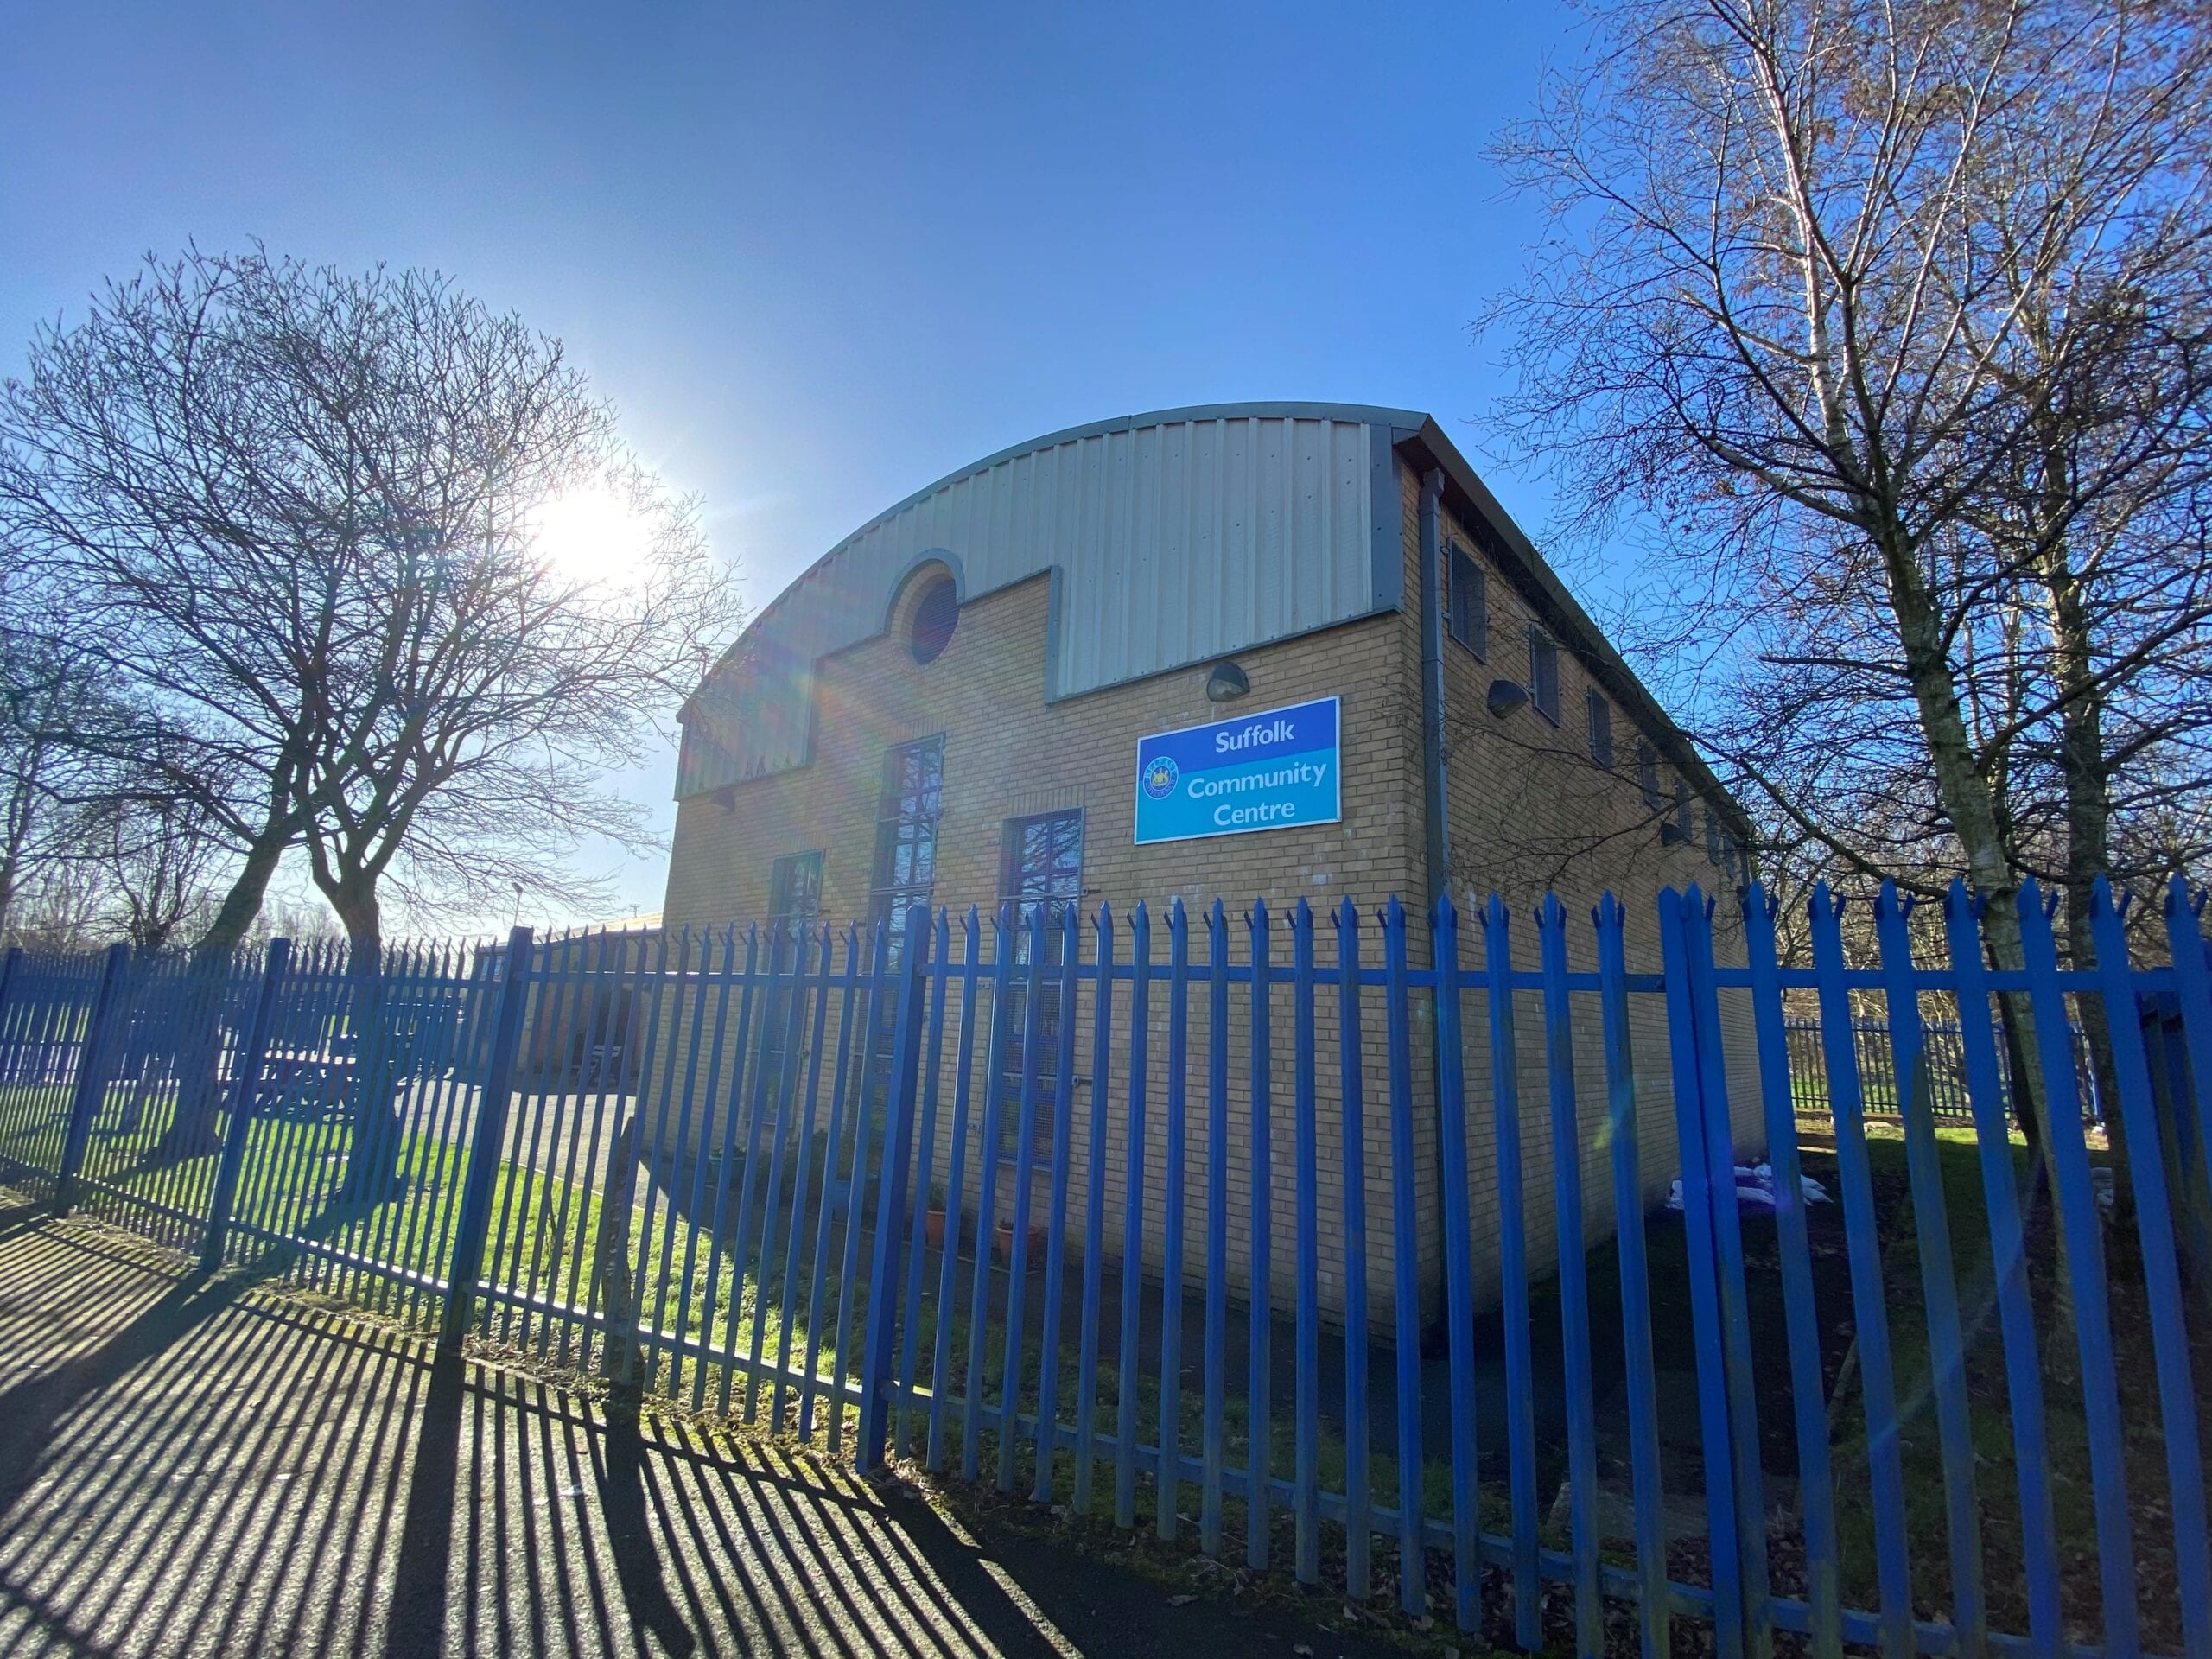 Suffolk Community Centre Chimney Installation Featured Image